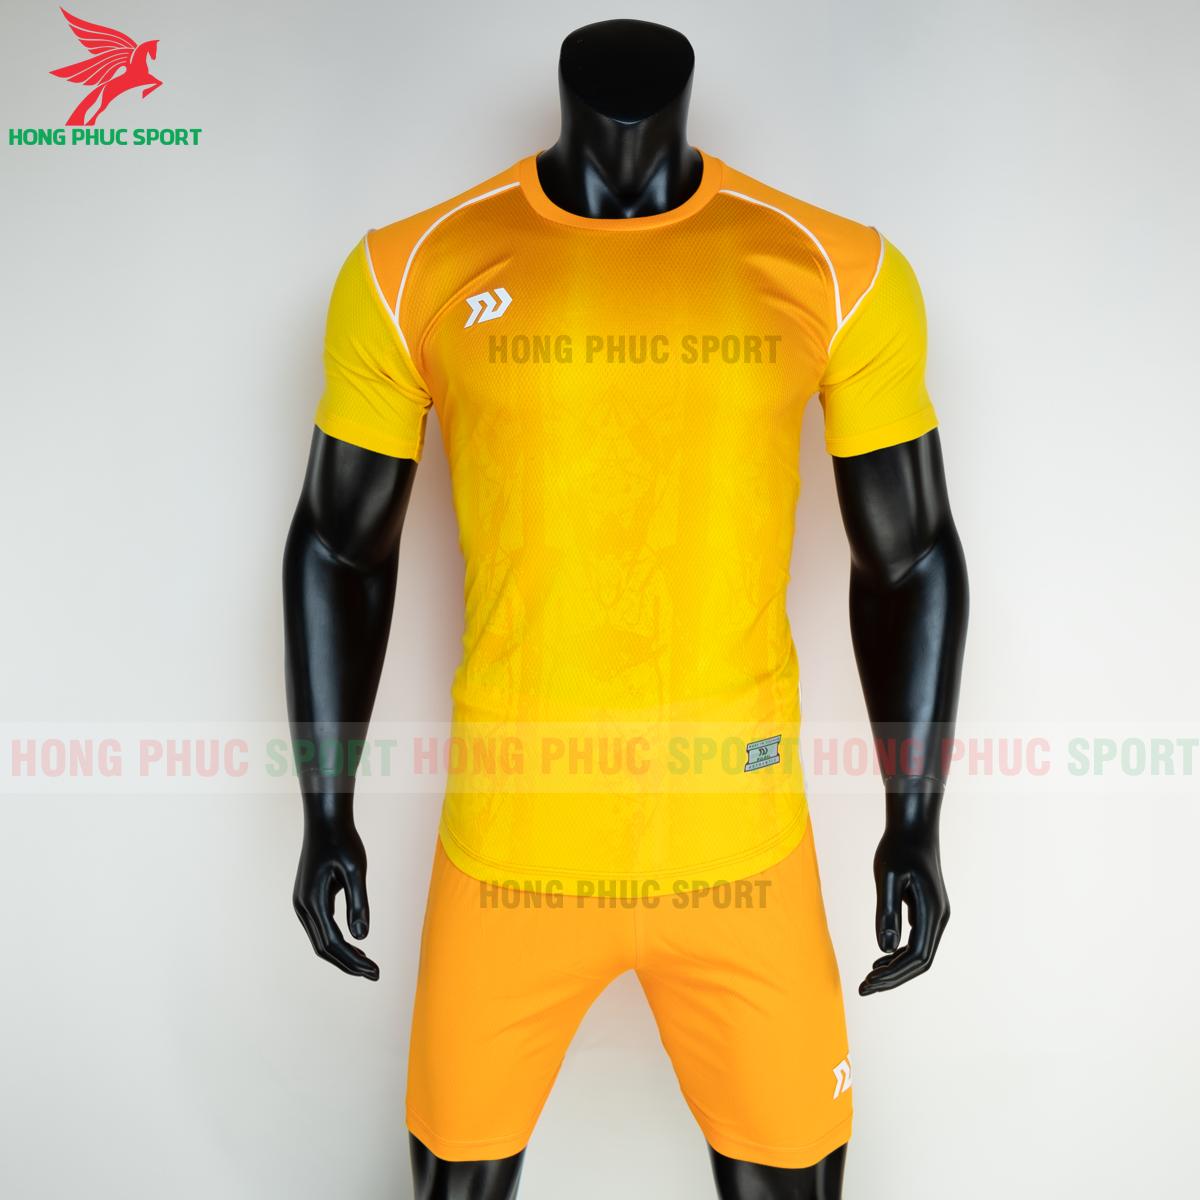 https://cdn.hongphucsport.com/unsafe/s4.shopbay.vn/files/285/ao-bong-da-khong-logo-bulbal-hades-mau-vang-2-604f31e8afe96.png